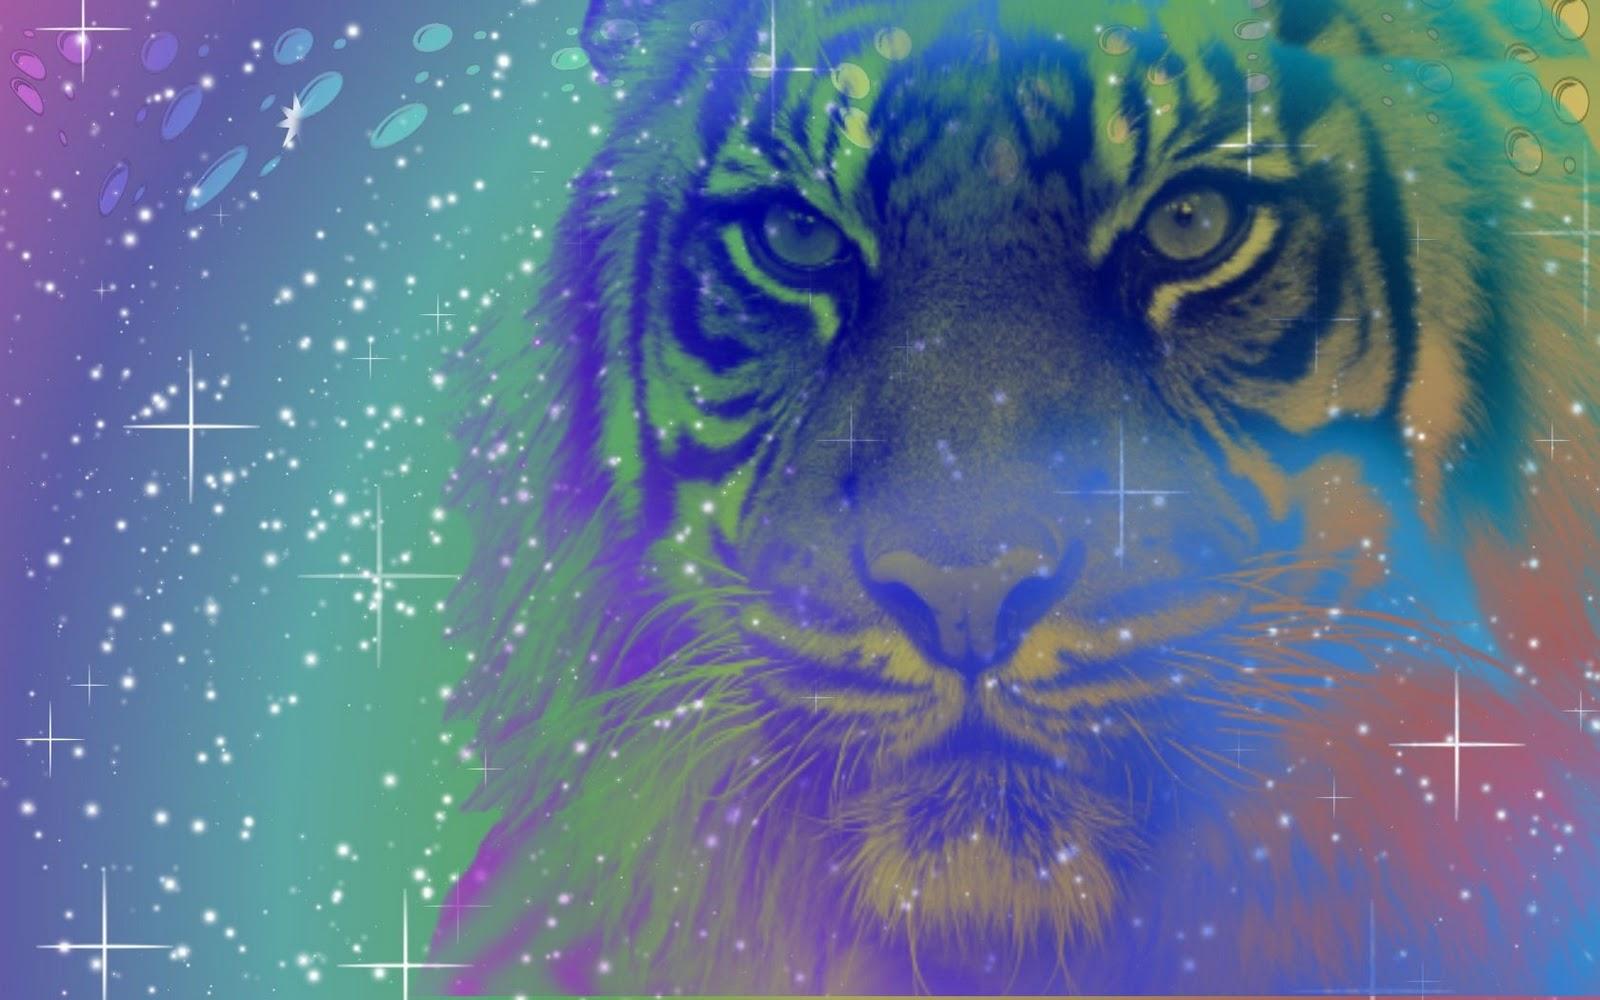 Tigre Gifs Animado: Gifs Animados Cia: Tigre Com Glitter